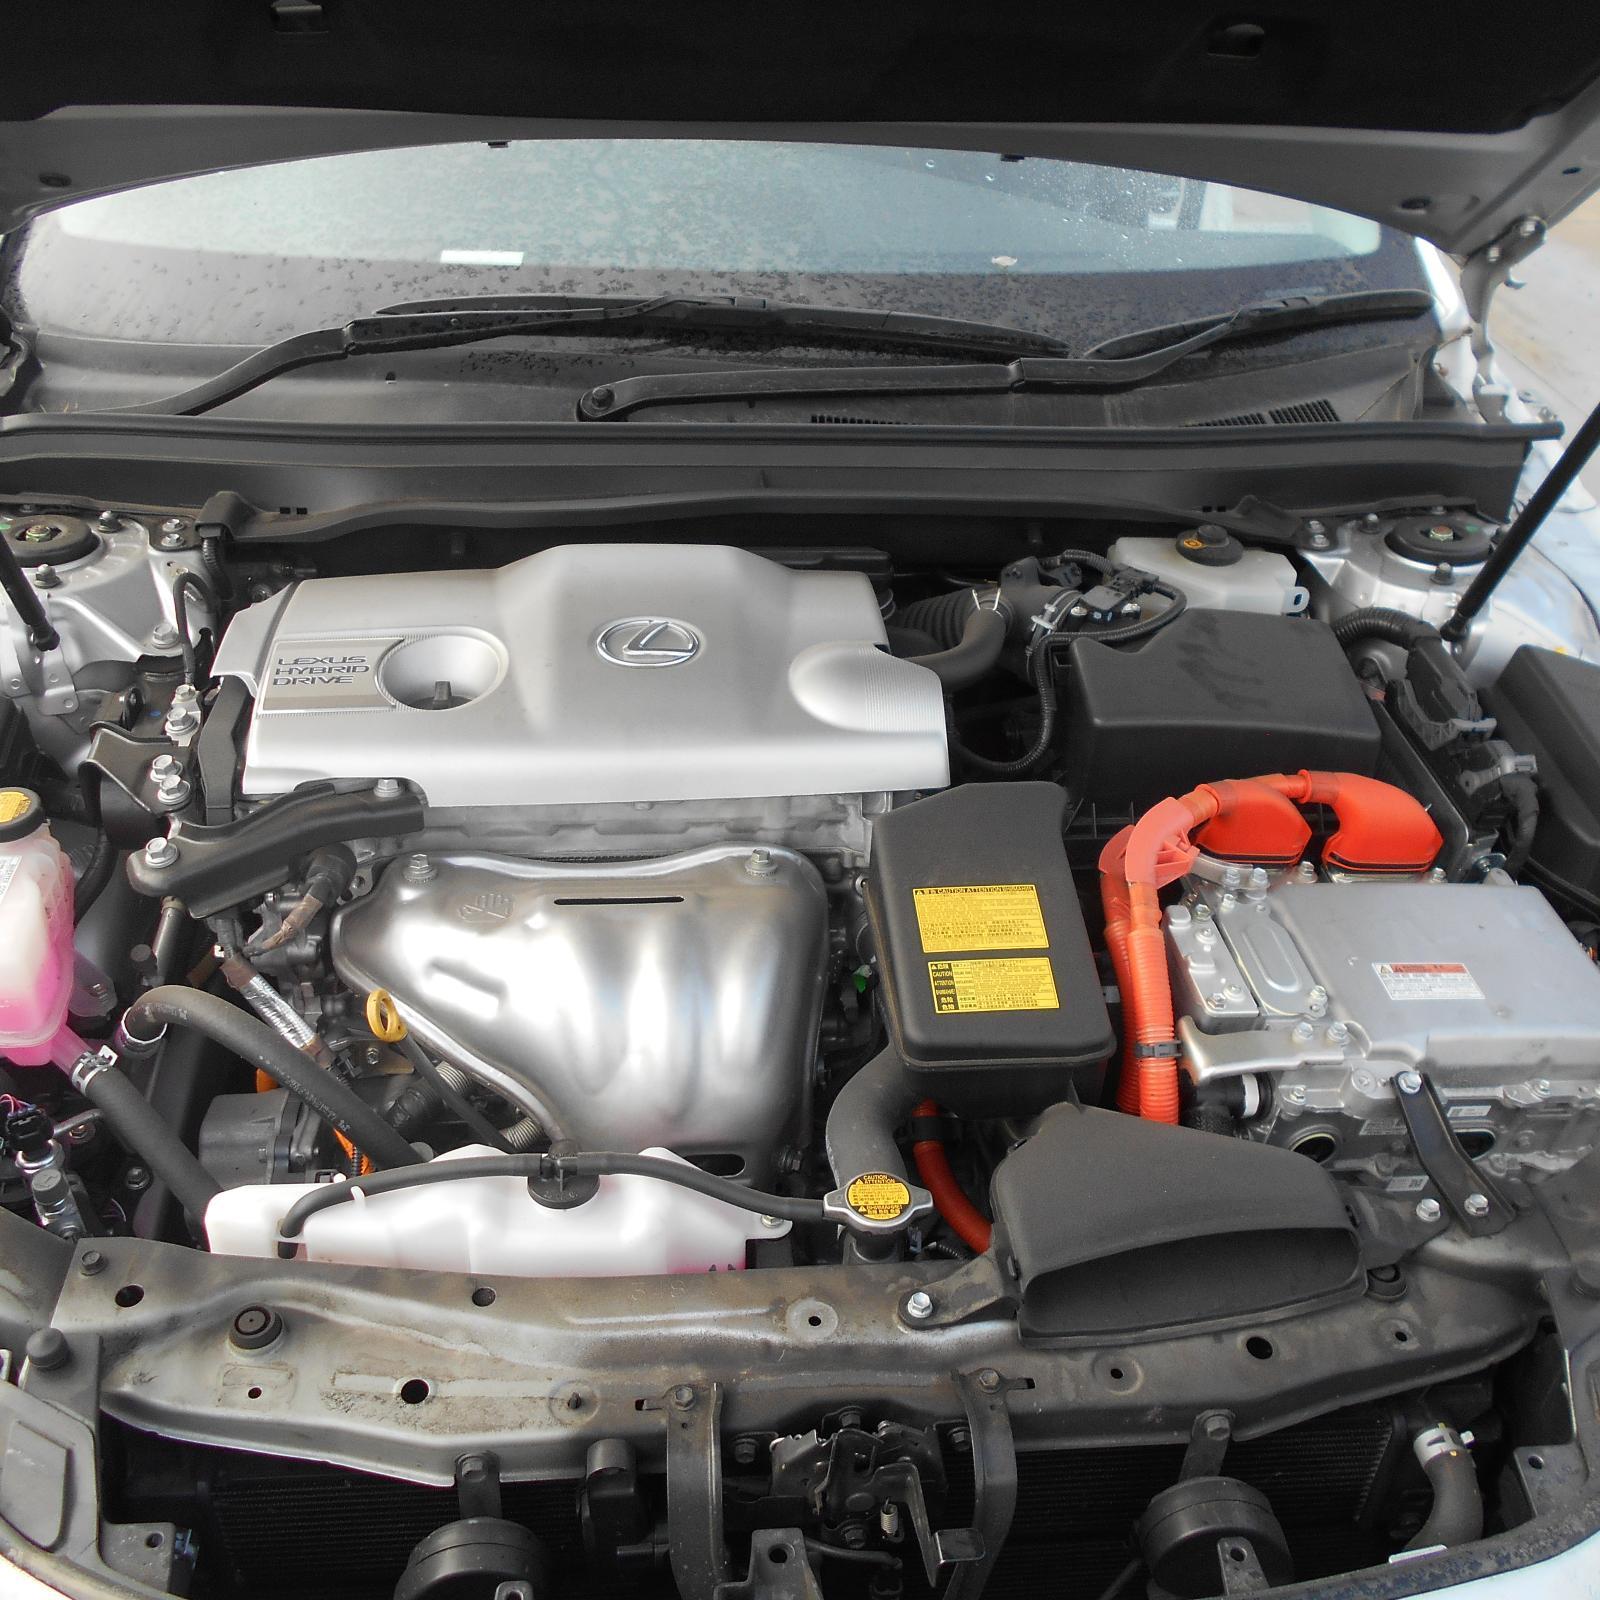 LEXUS ES SERIES (13-), Trans/Gearbox, AUTO, PETROL, 2.5, HYBRID, ES300H, AVV60R/GSV60R, 11/13-07/18